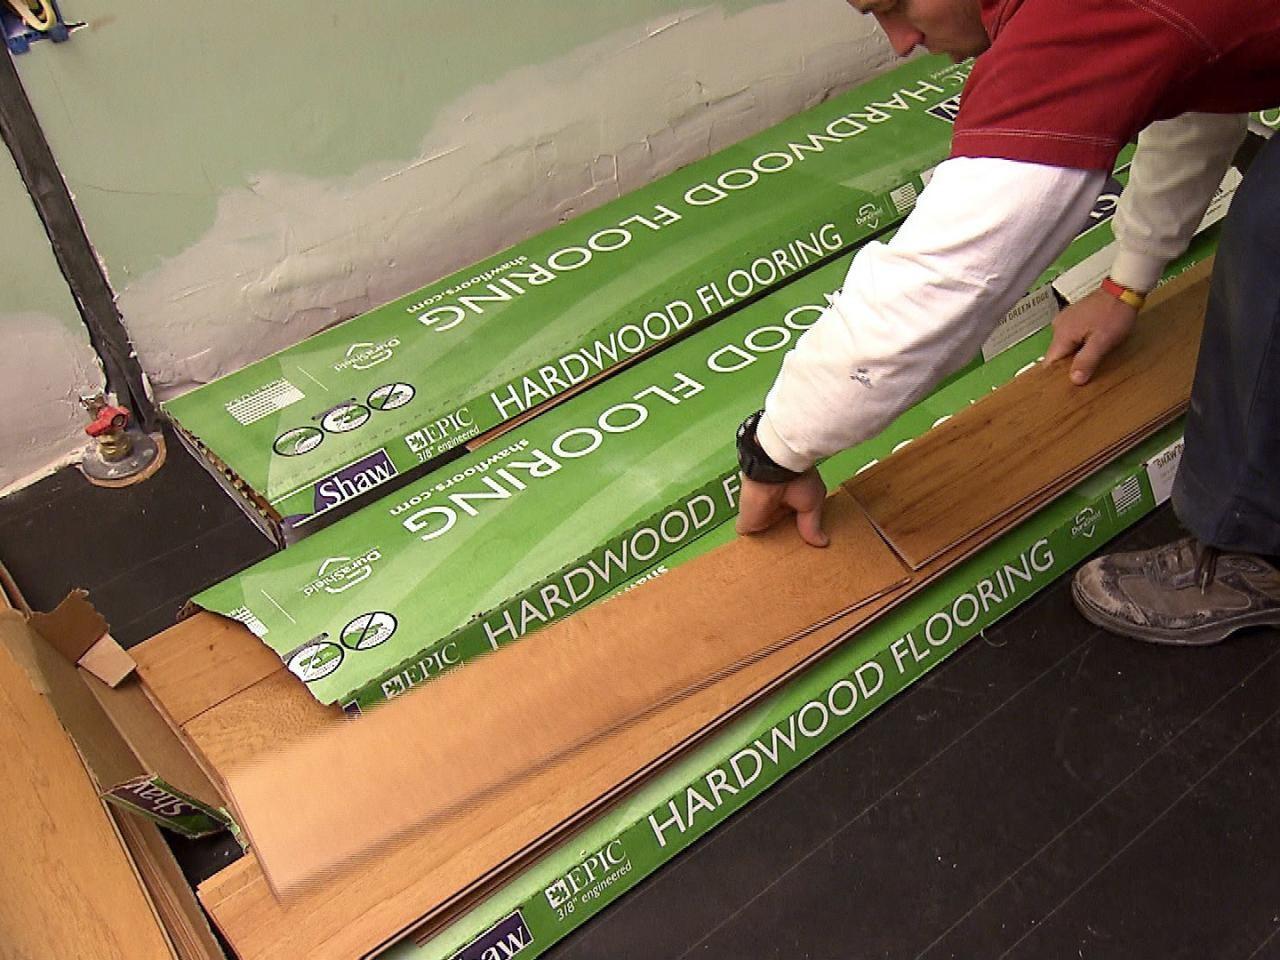 28 Popular Replacing Engineered Hardwood Floor Planks 2021 free download replacing engineered hardwood floor planks of 14 new average cost for hardwood floors stock dizpos com with average cost for hardwood floors awesome how to install an engineered hardwood flo